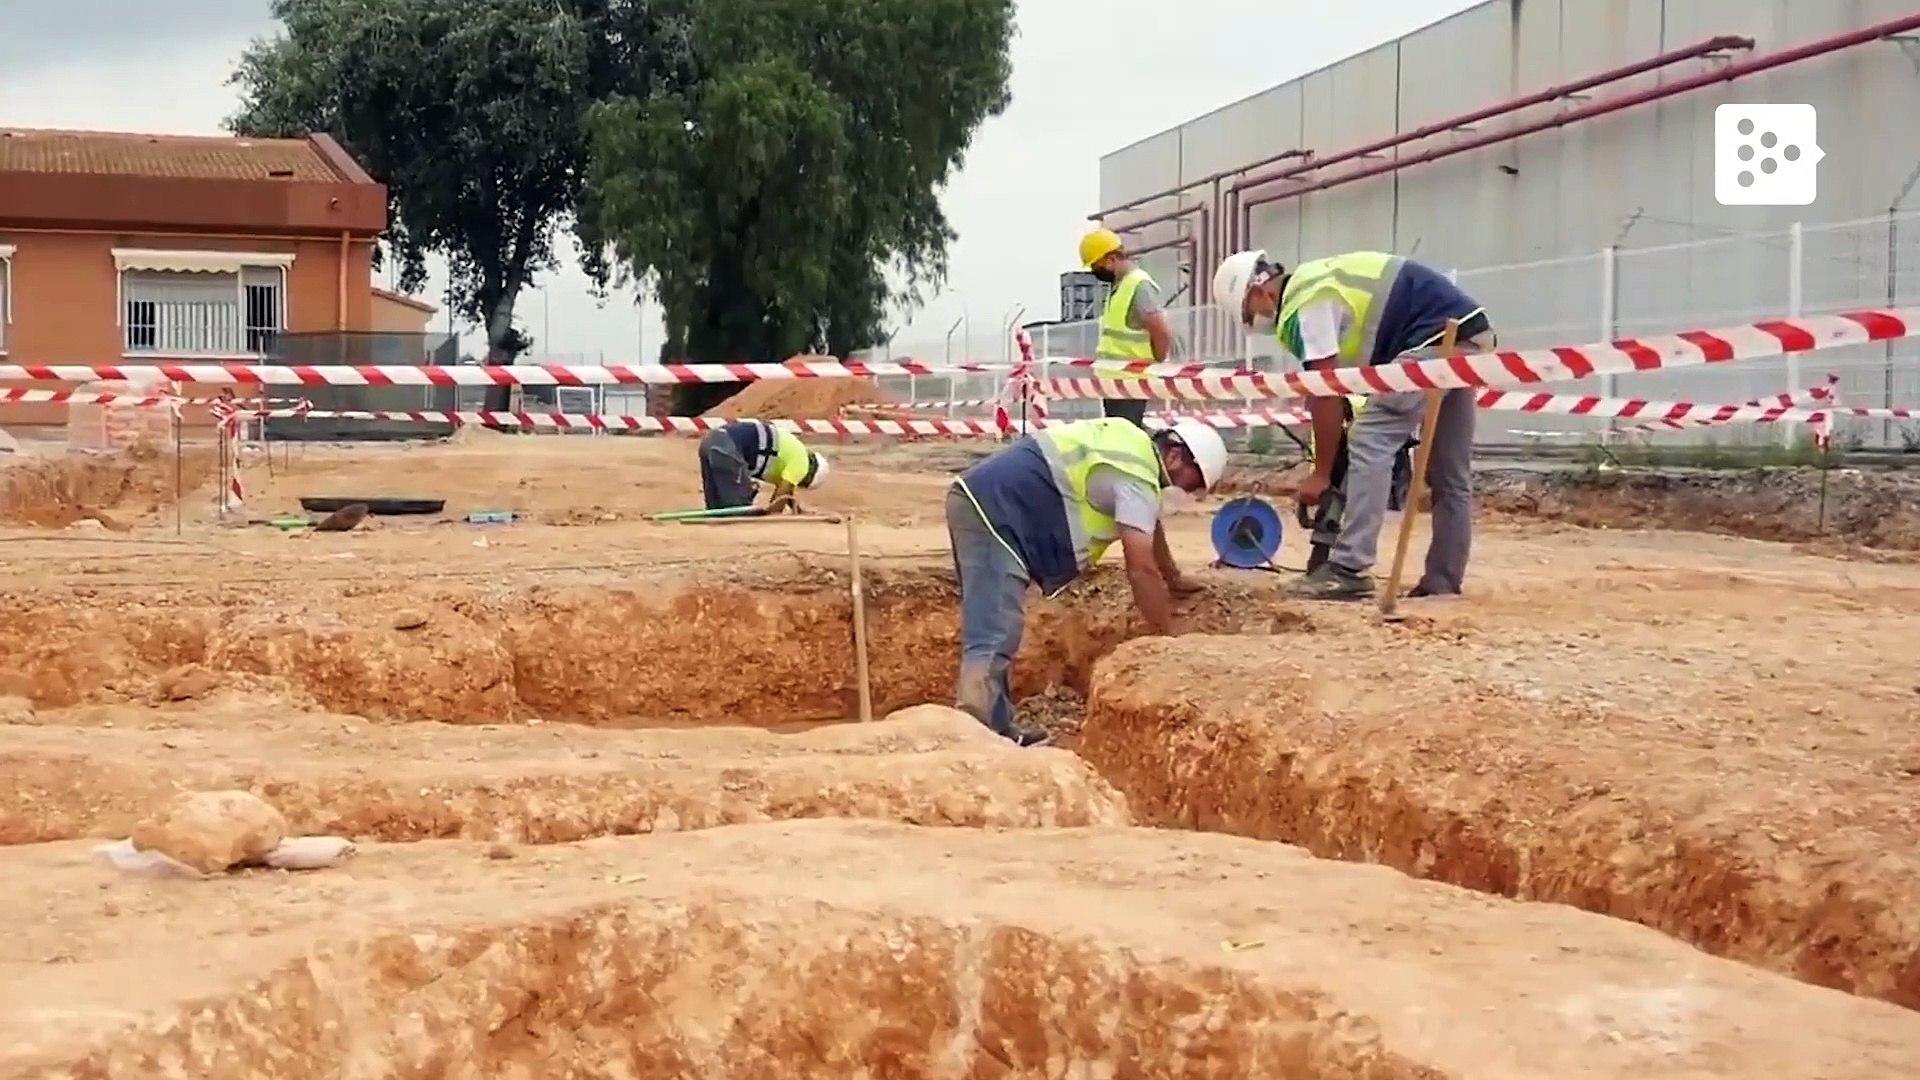 Workers find a Visigothic necropolis under a school in Spain